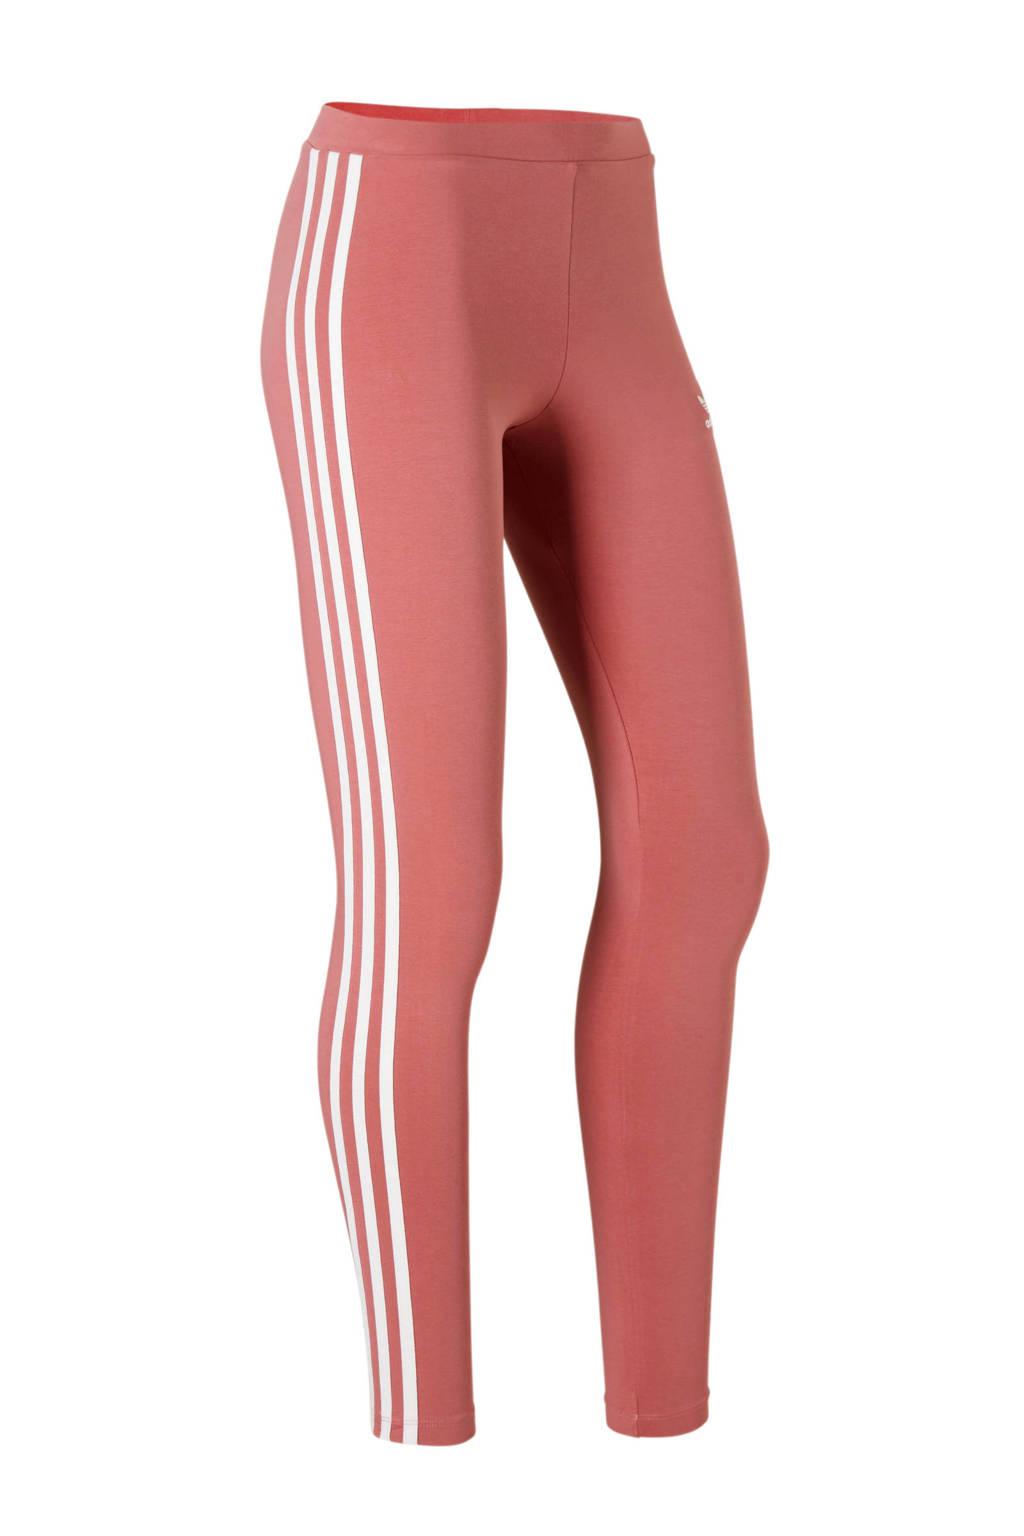 ceff429d1d7 adidas originals broek oudroze | wehkamp